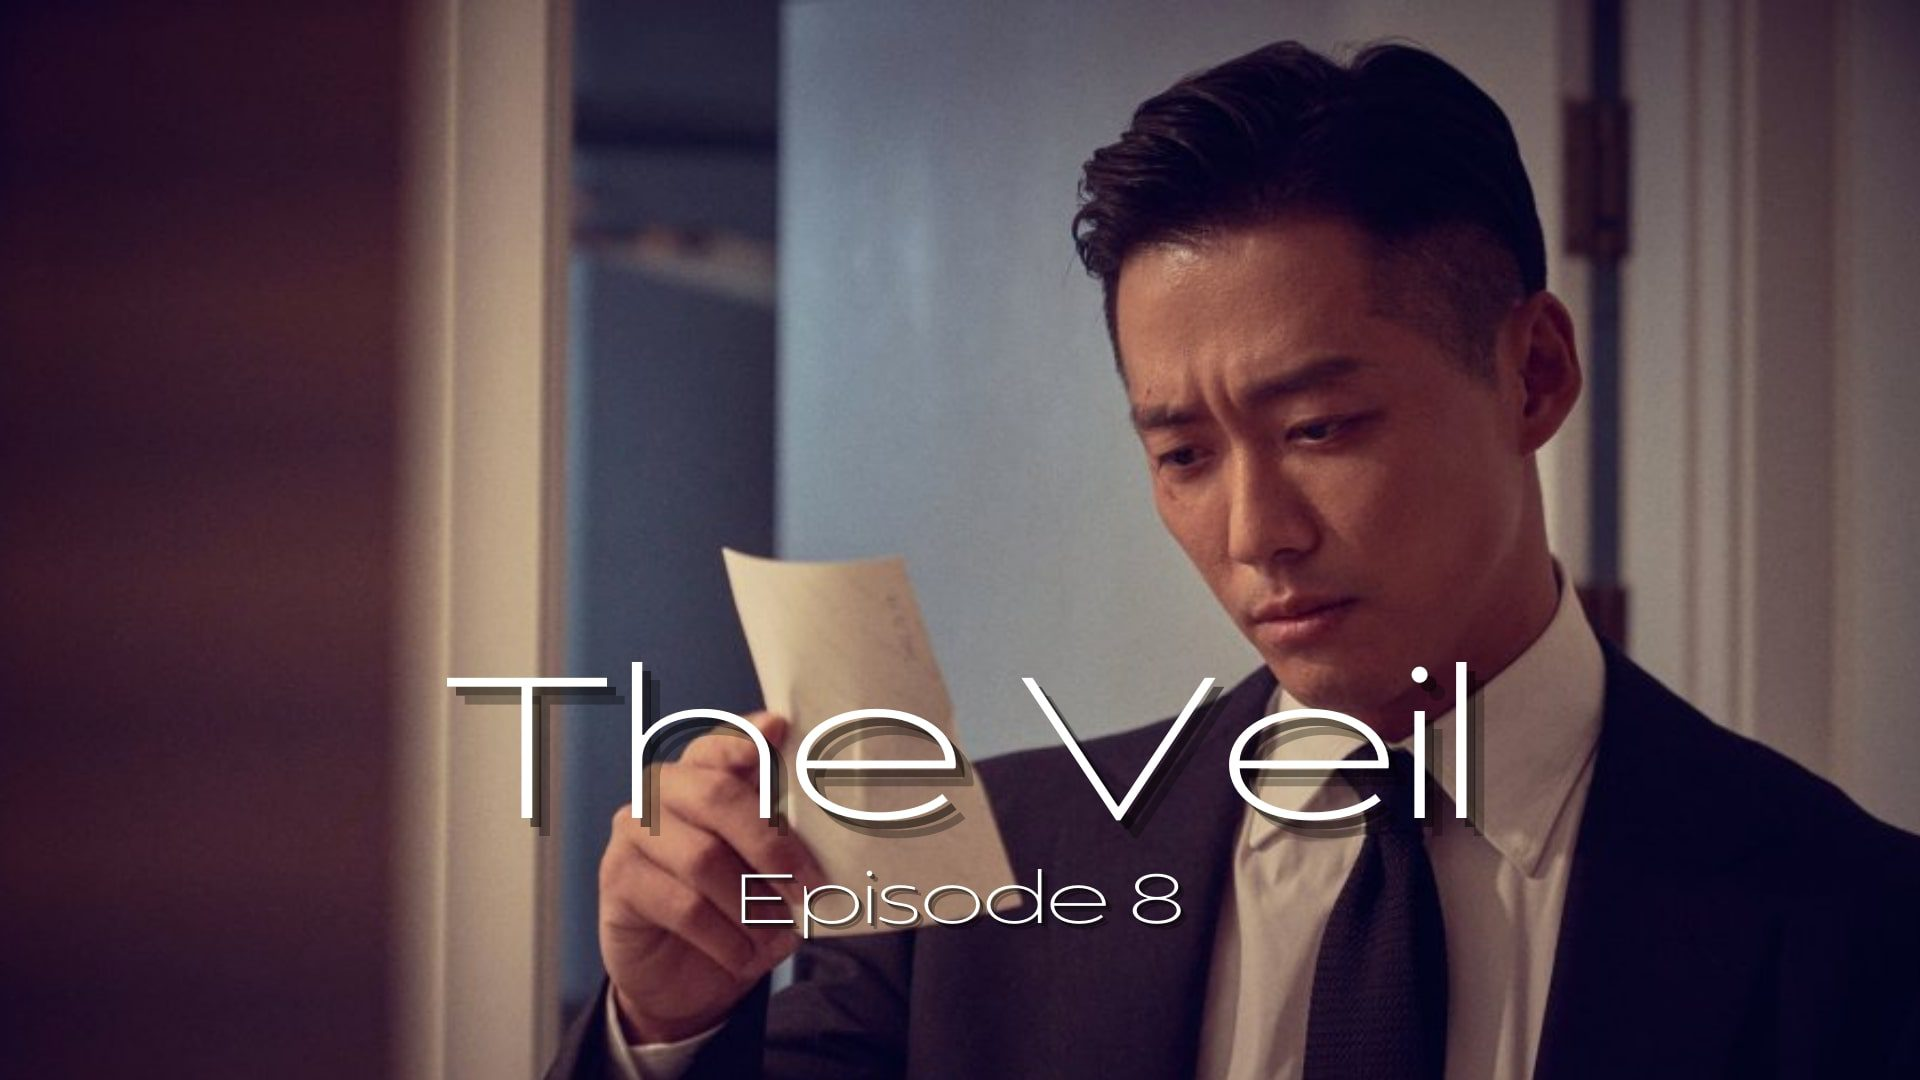 The Veil Episode 8